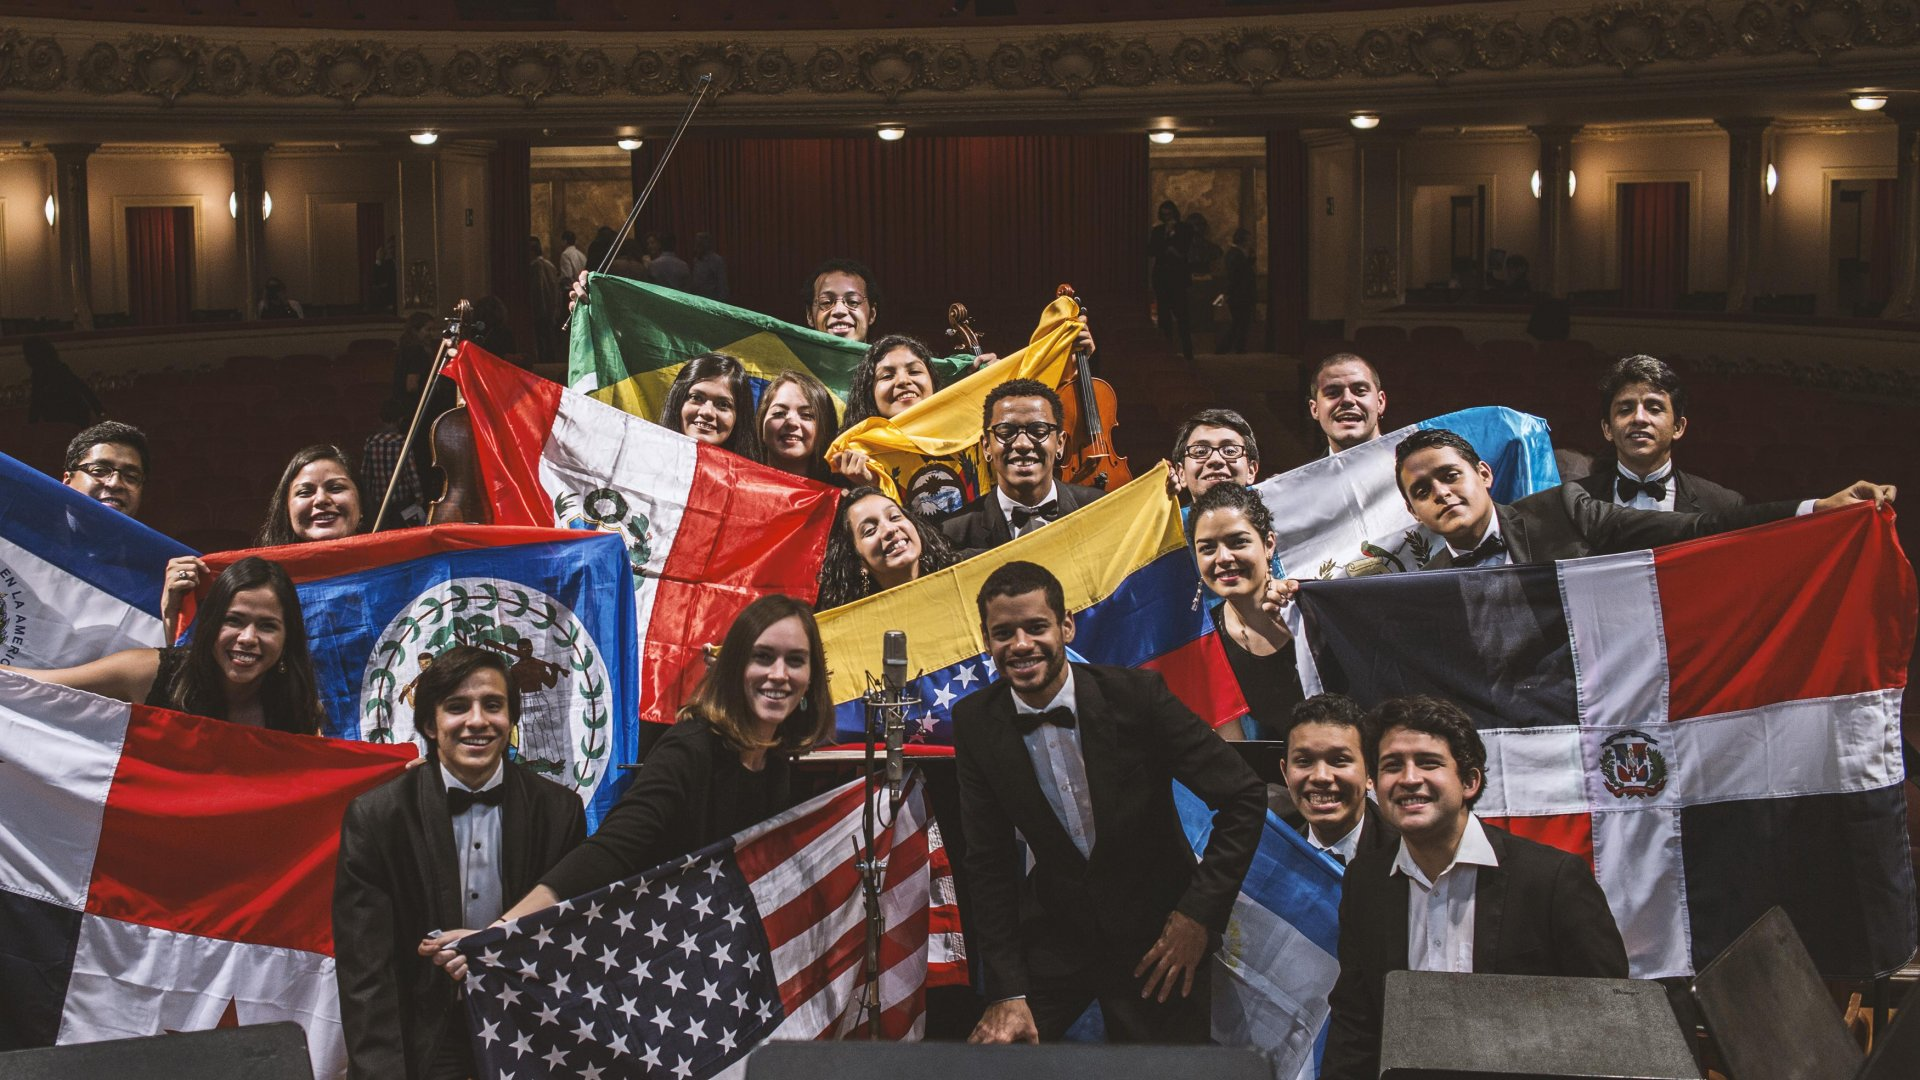 Оркестр стран Америки и Европы (The Orchestra of the Americas)